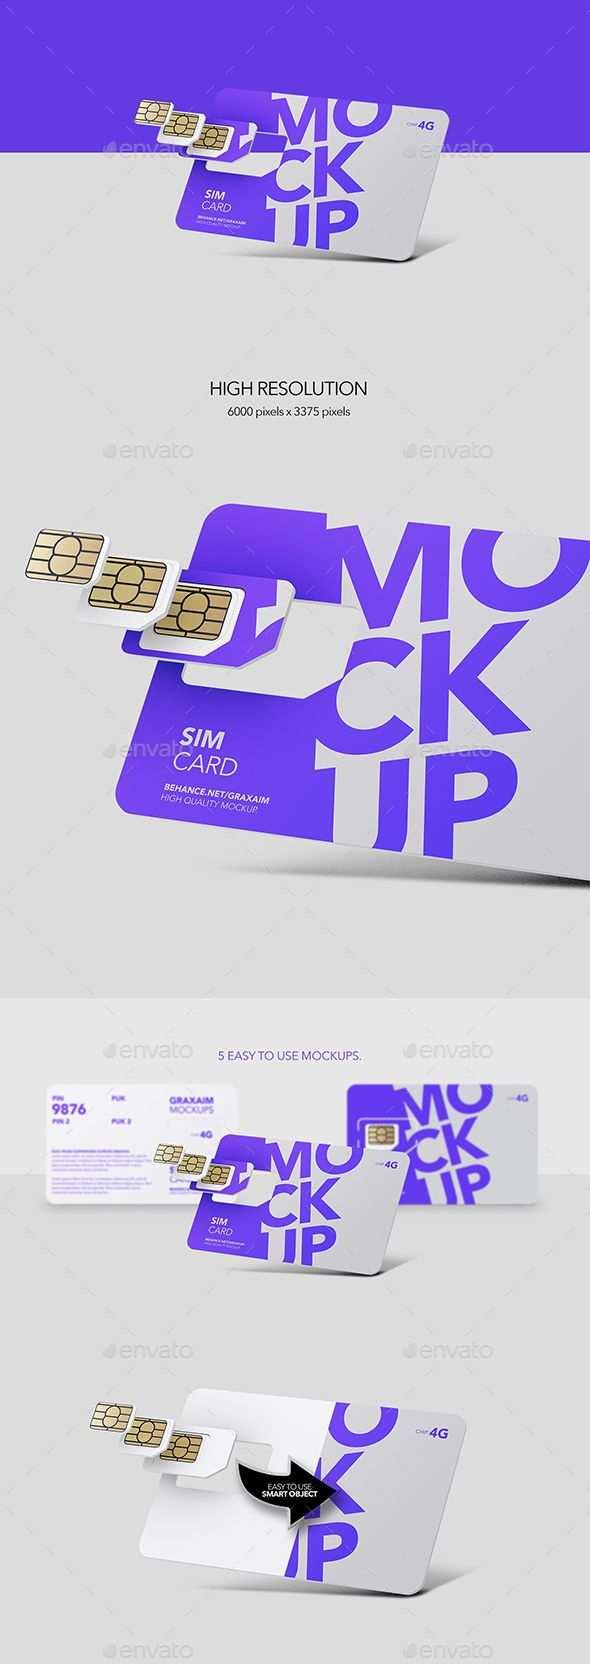 Sim Card Chip Mockup In 2020 Packaging Template Design Paper Nano Card Templates Printable